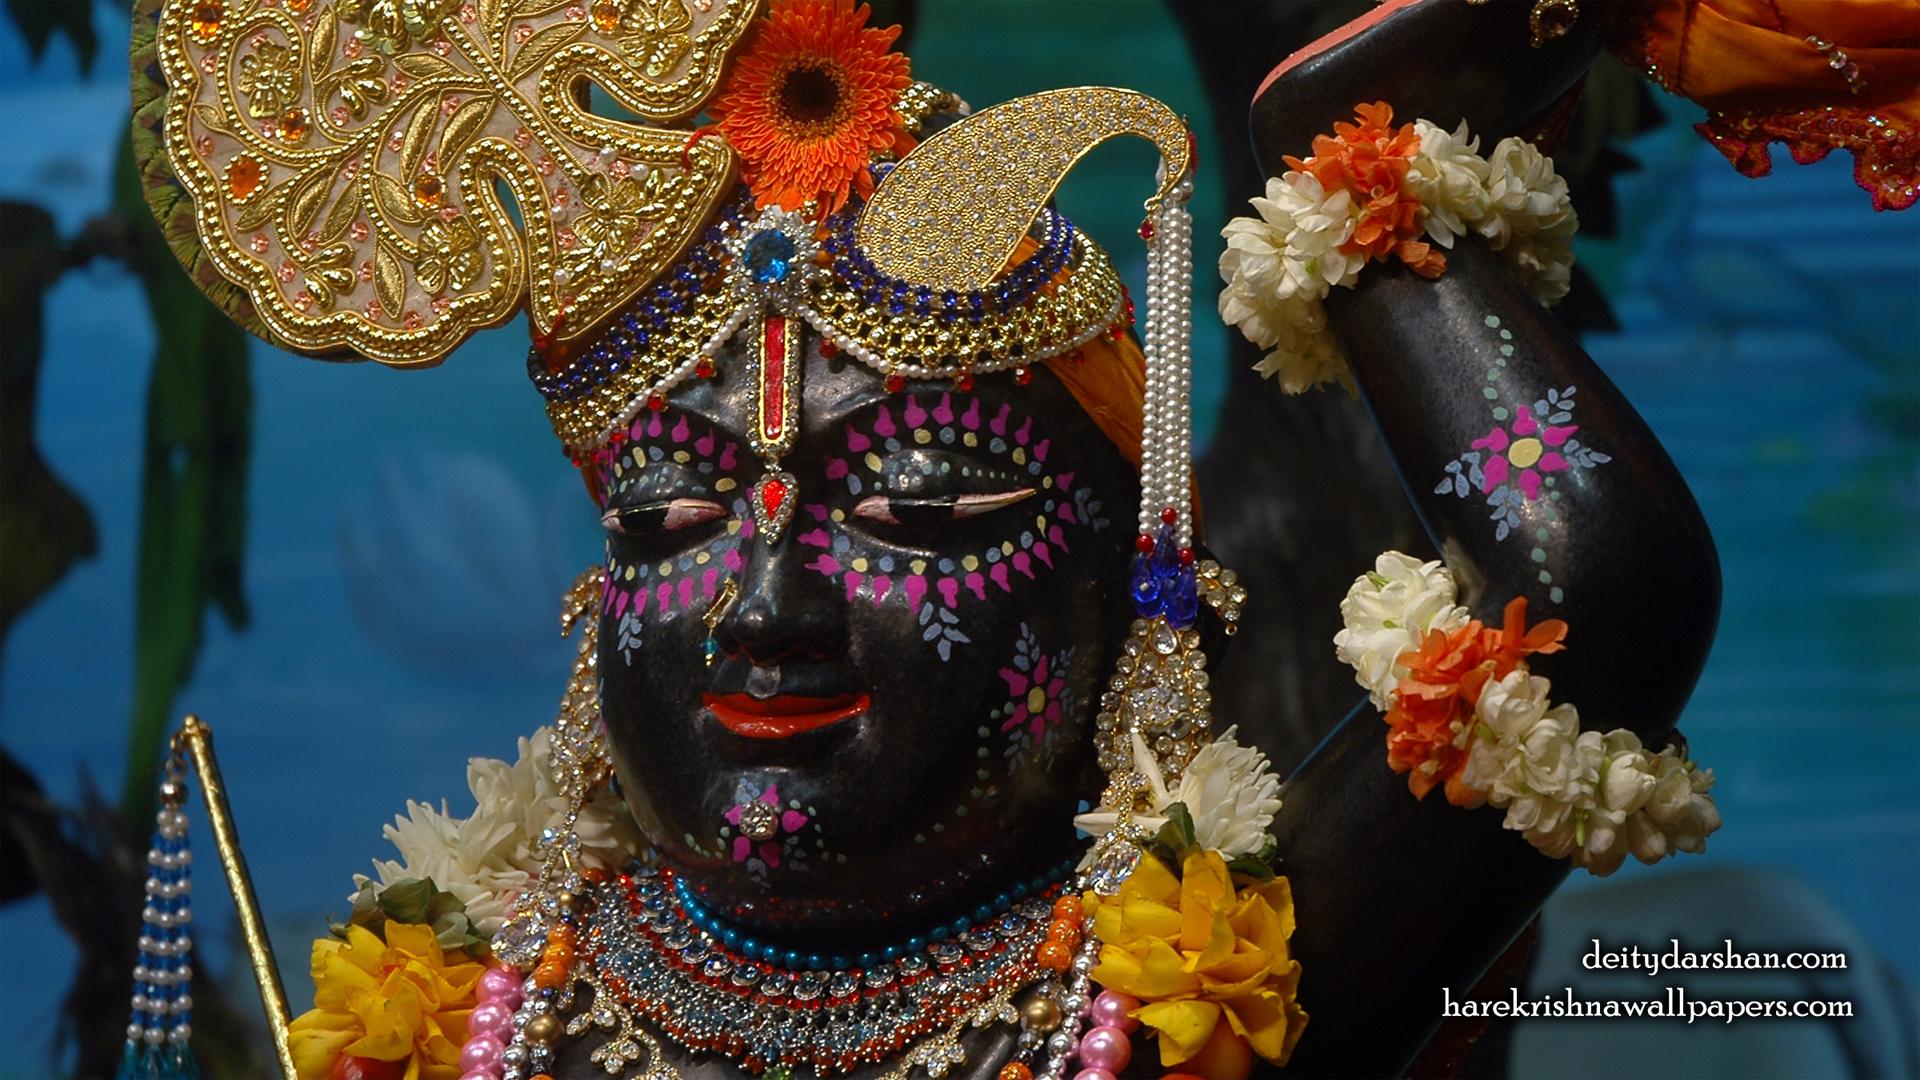 Sri Gopal Close up Wallpaper (045) Size 1920x1080 Download